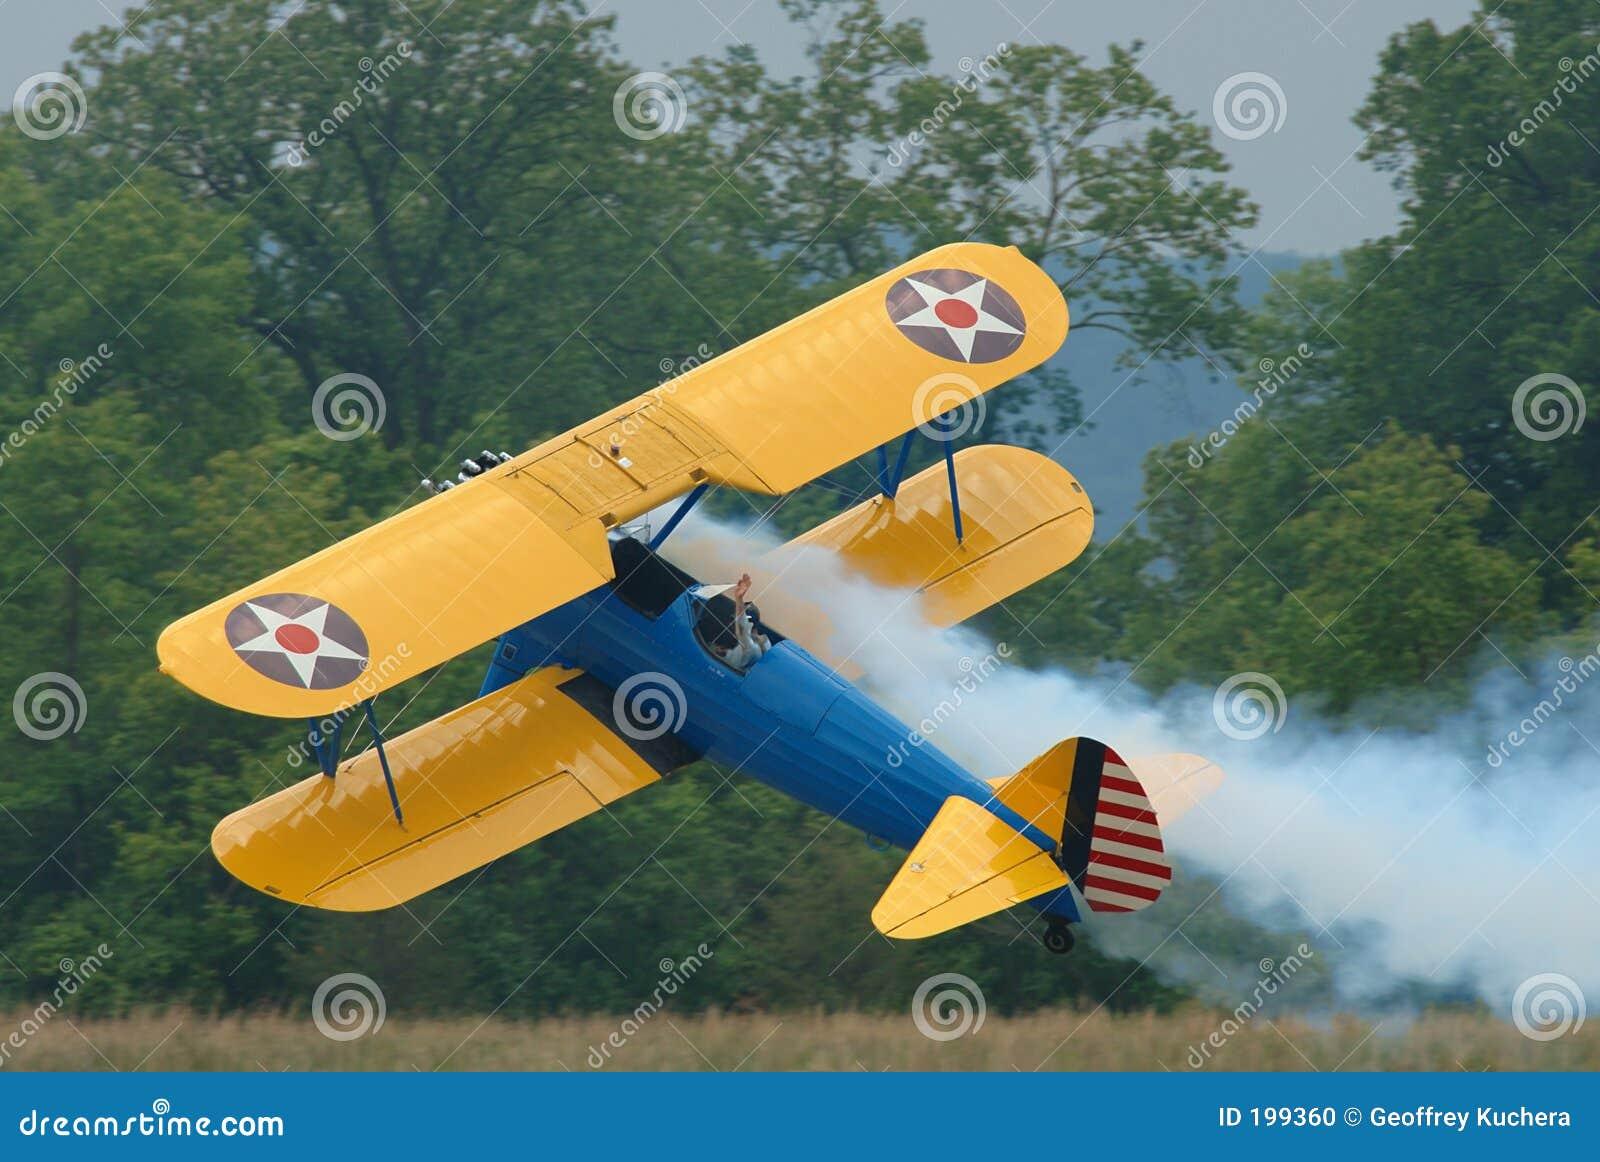 Vol de biplan latéral